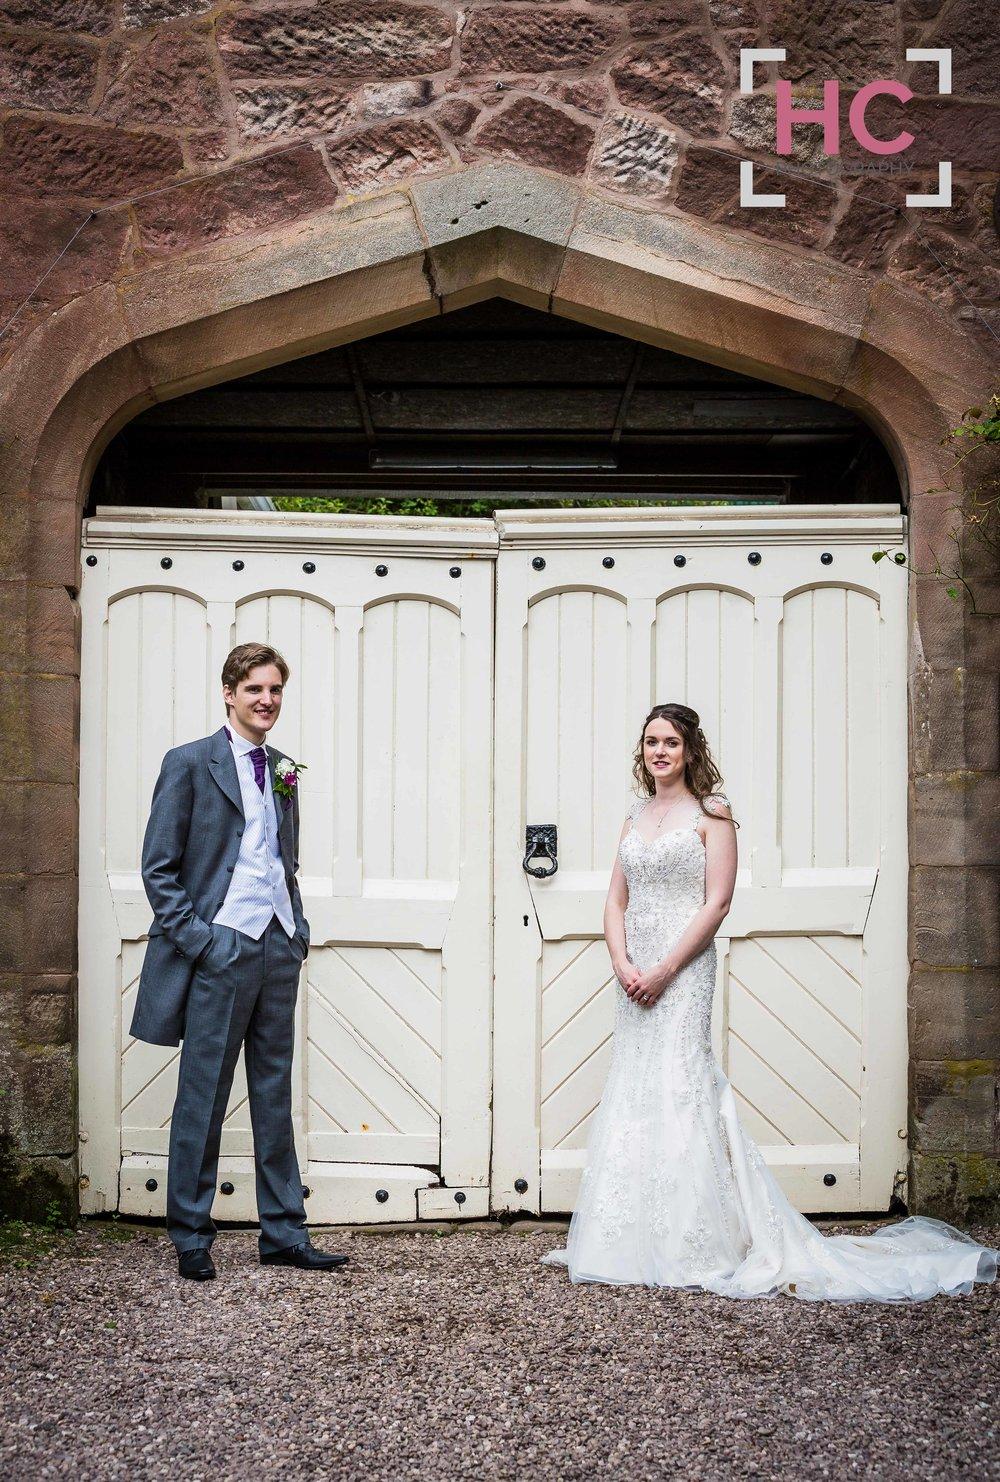 Thomas & Marcia's Wedding_Helen Cotton Photography©50.JPG